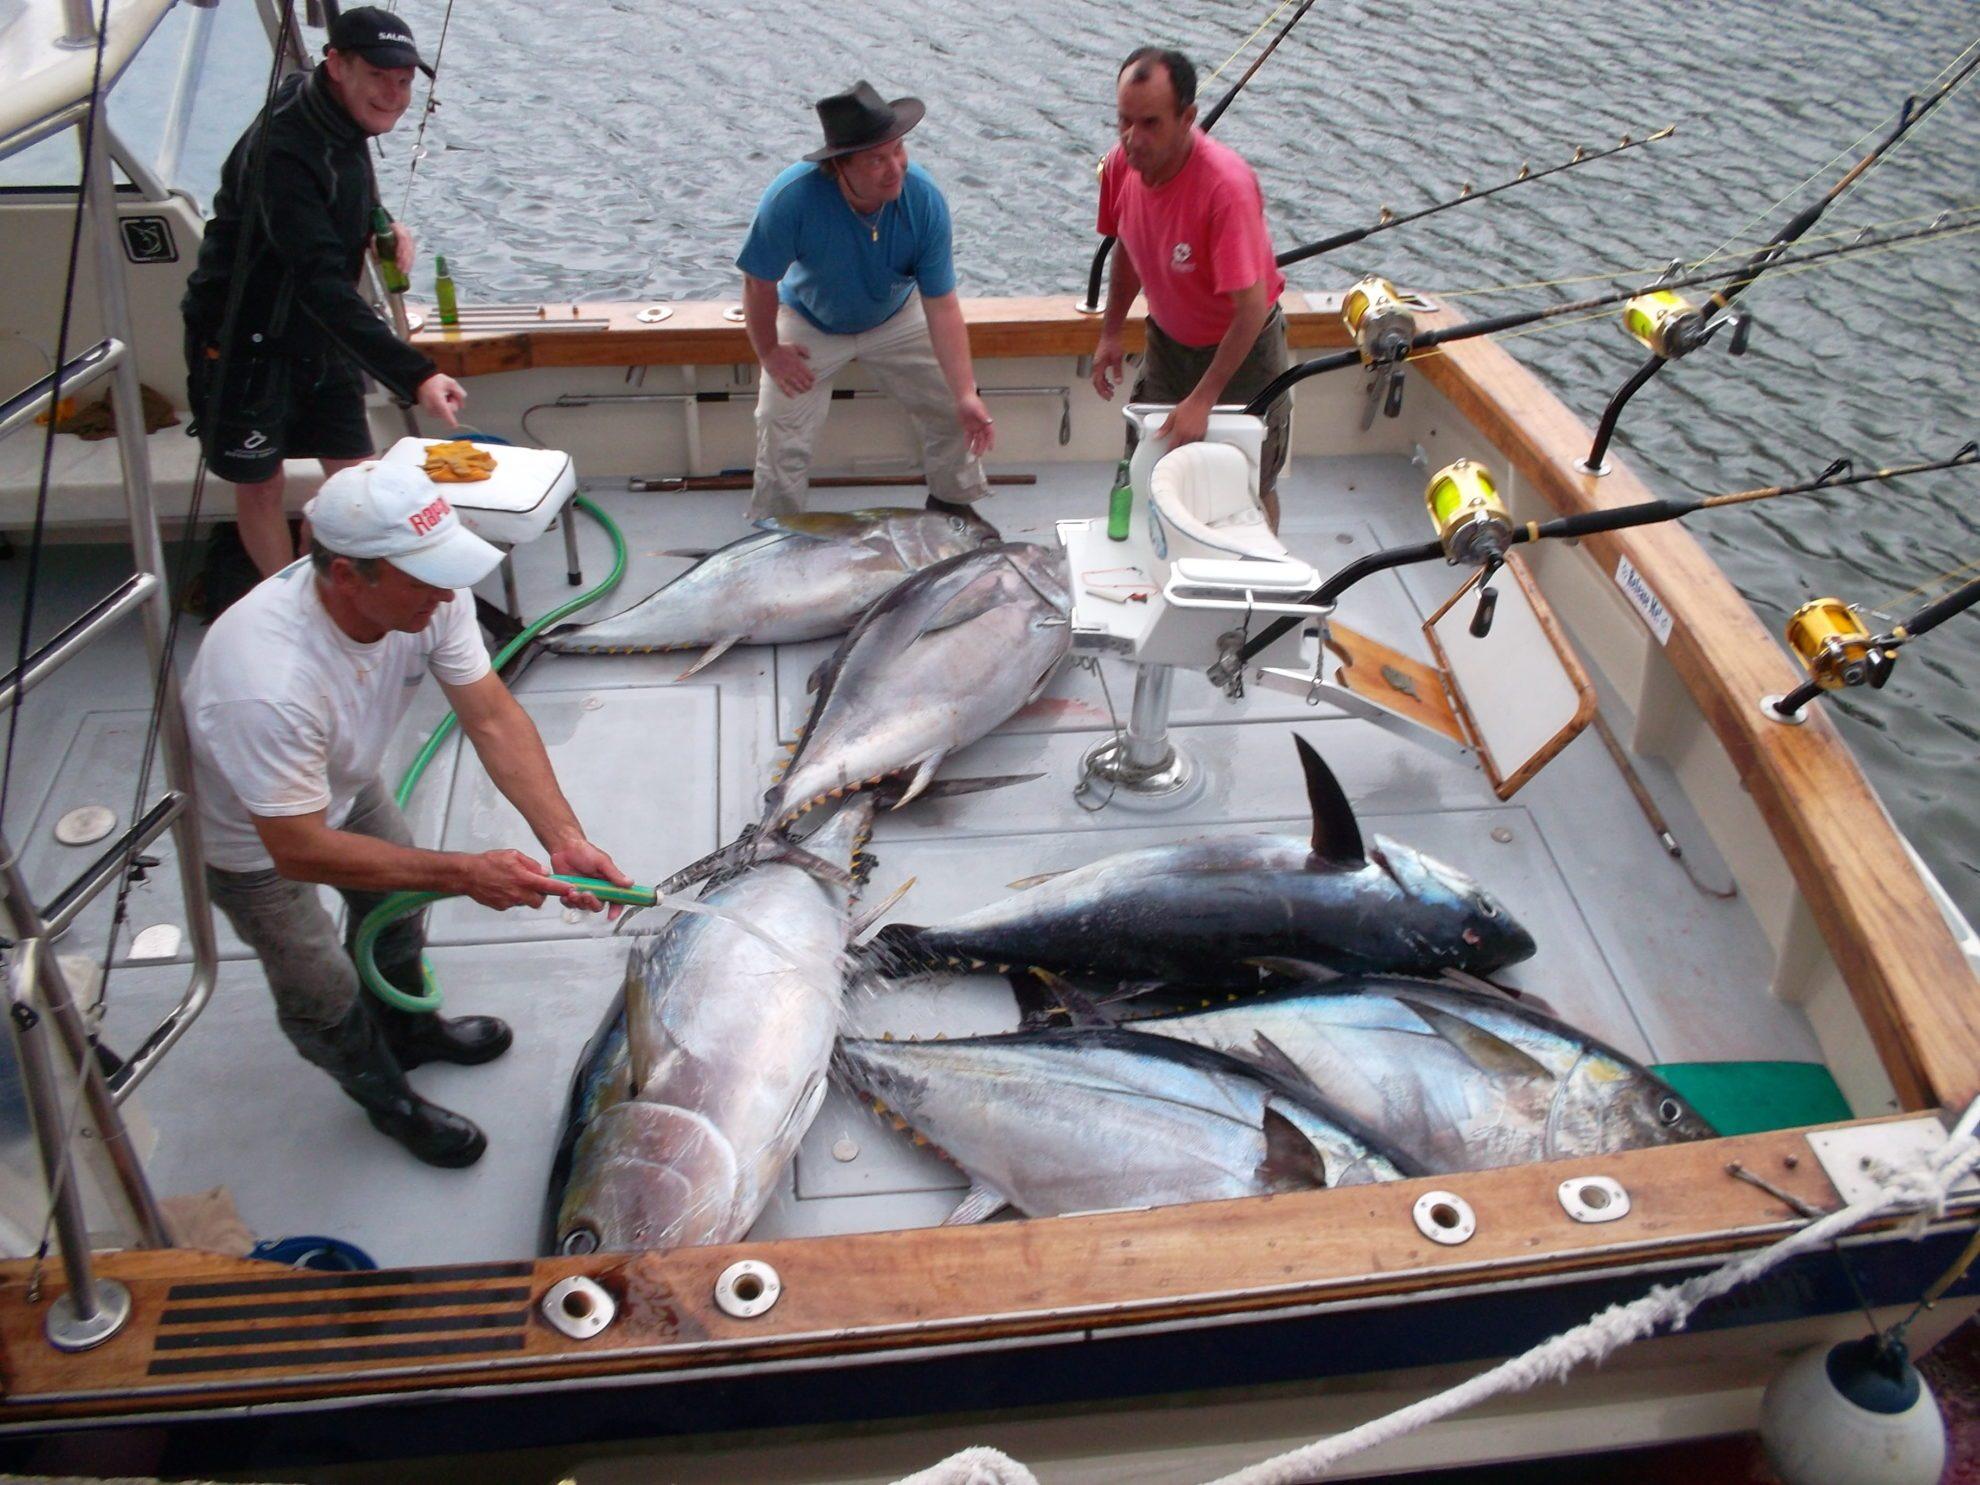 Морская спортивная рыбалка. Азорские острова, Сан-Мигел, Понта-Делгада.